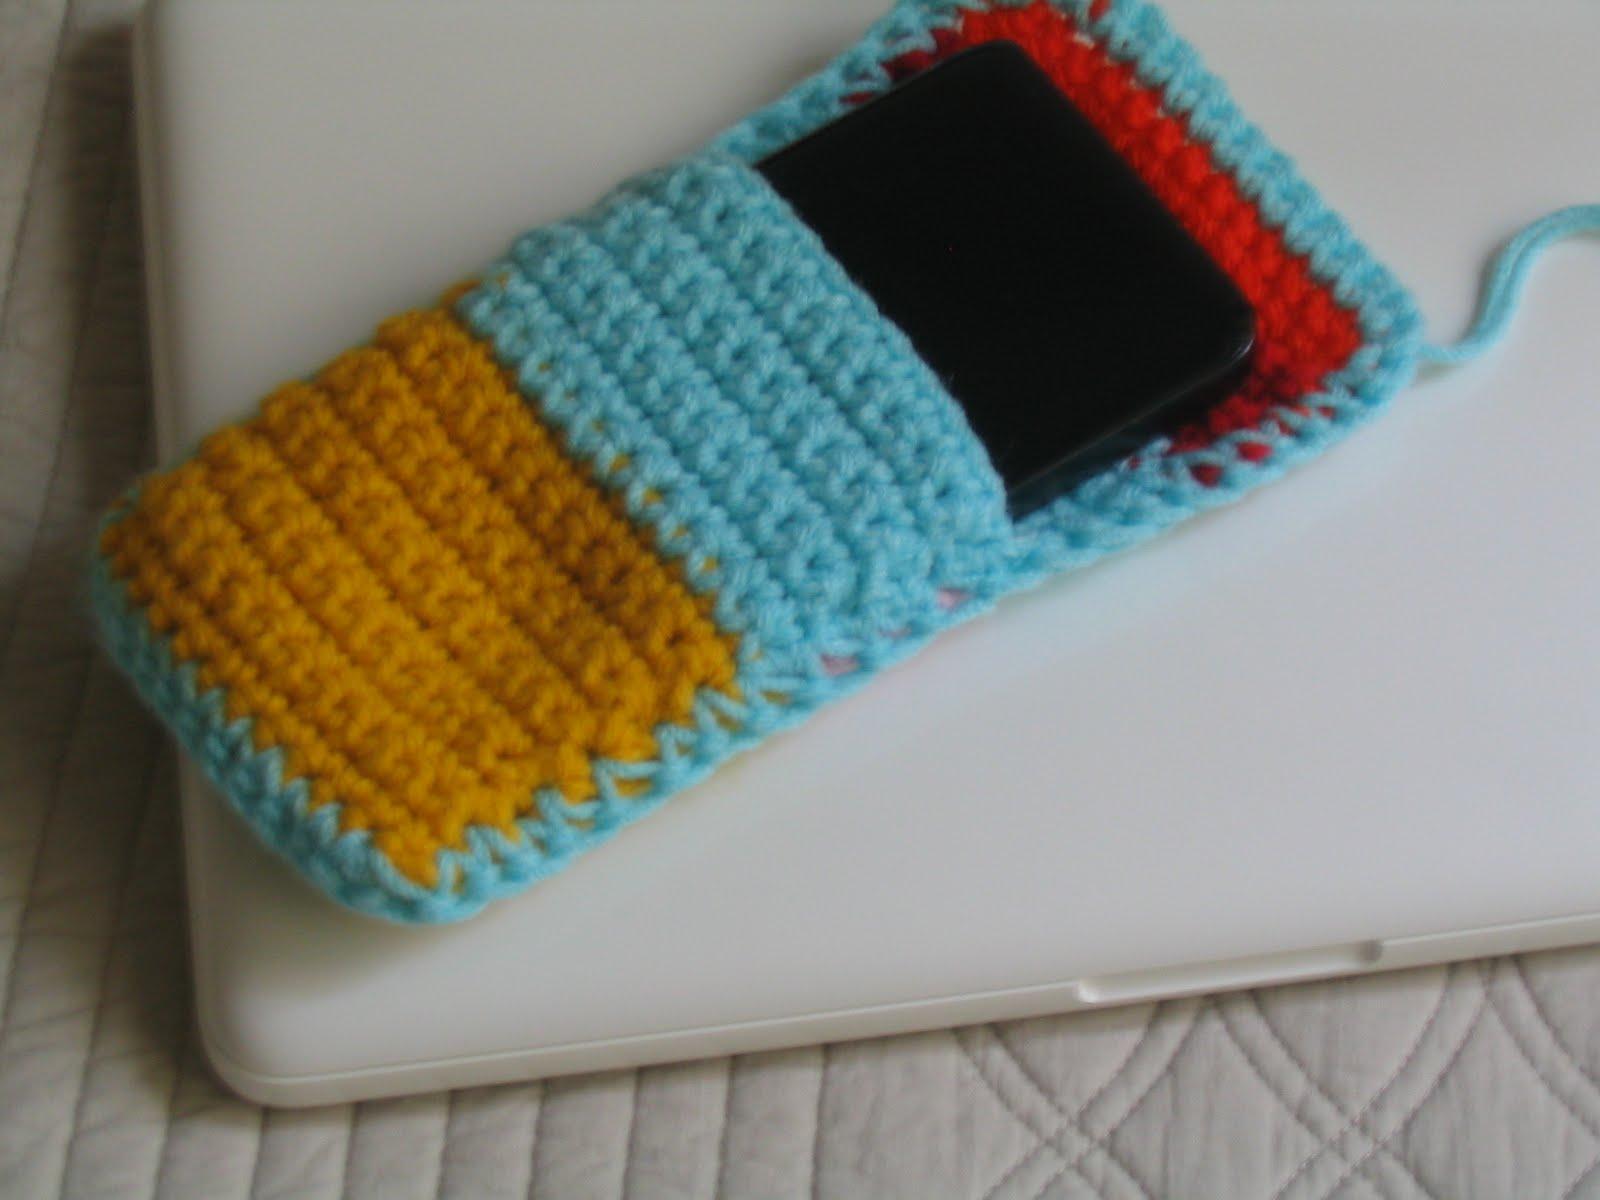 Puerta al sur fundas para notebook tejidas a crochet for Fundas notebook